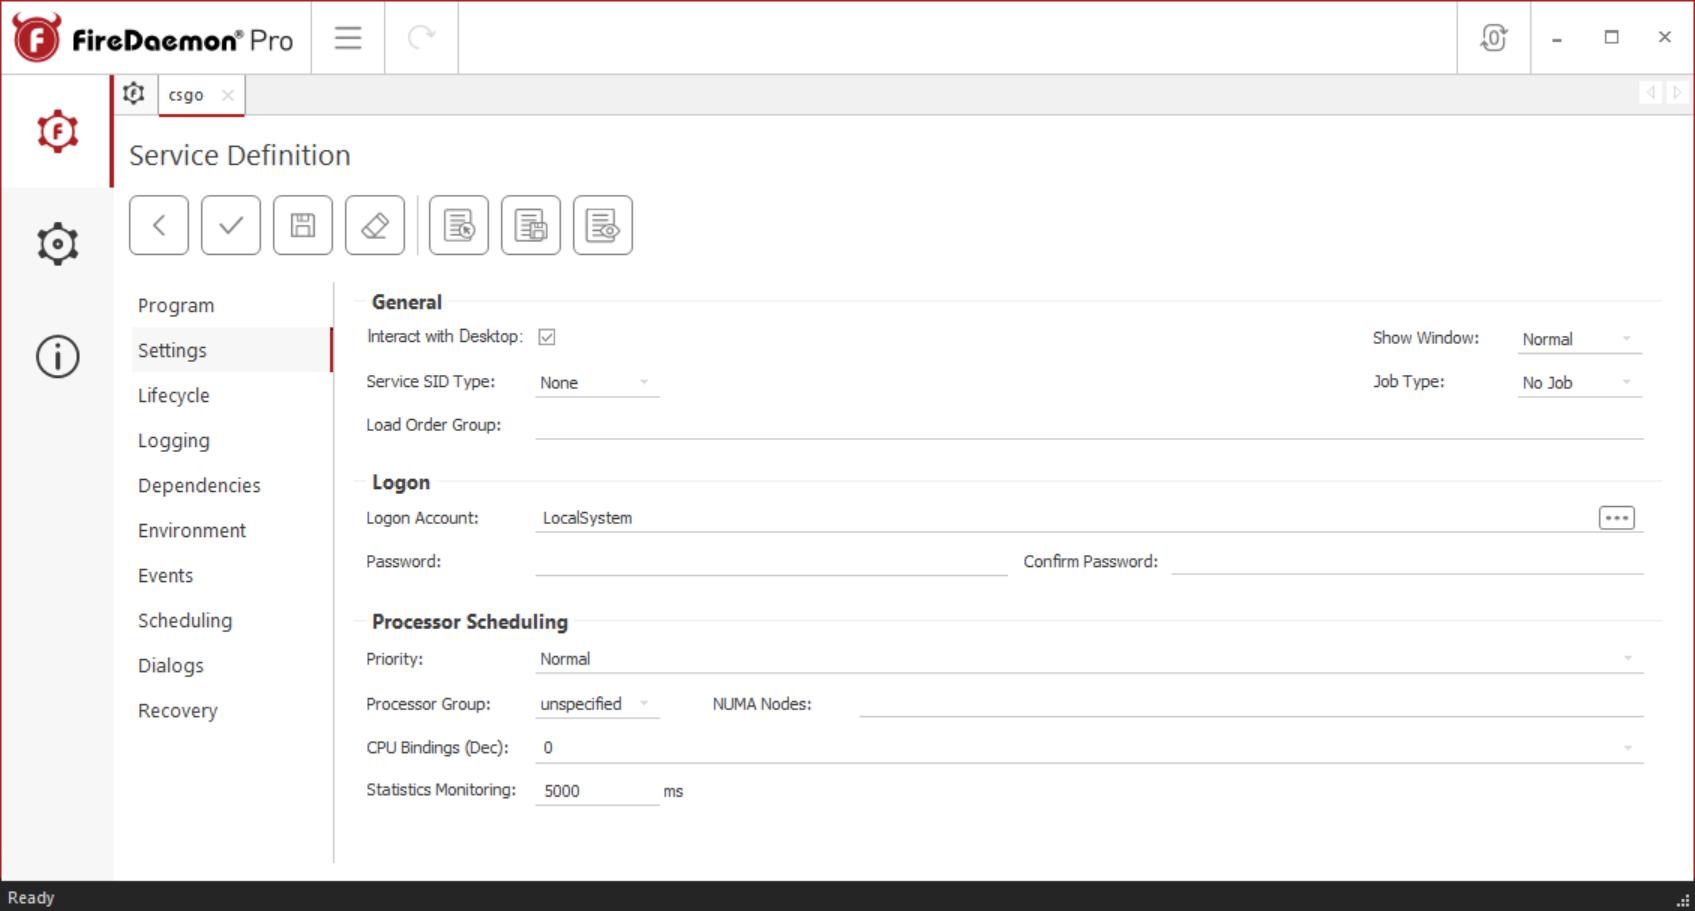 FireDaemon Pro CS:GO service settings